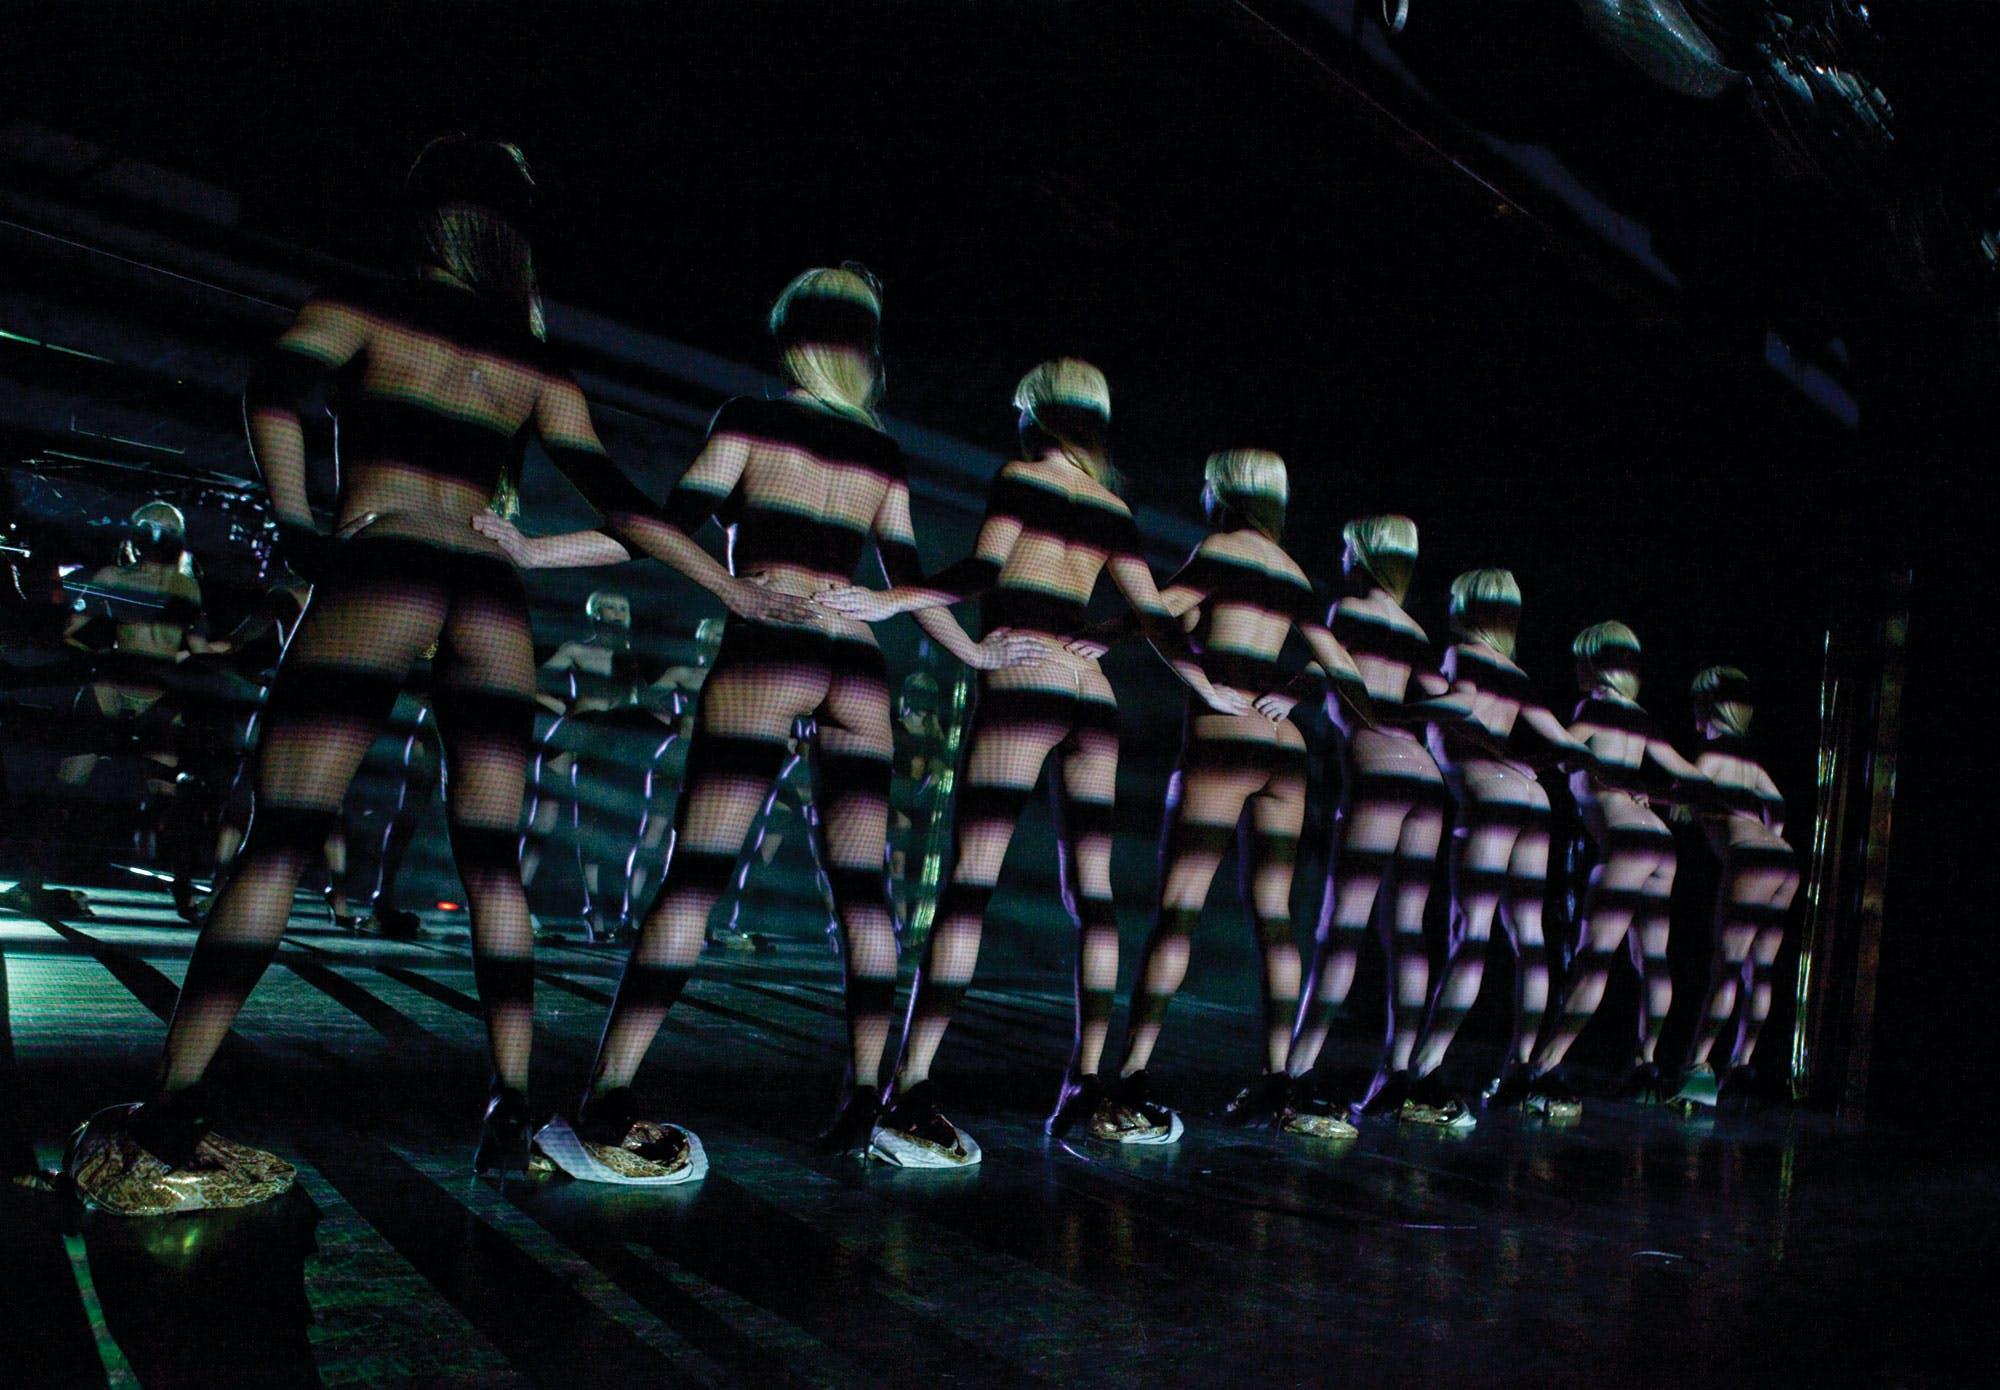 Best Vegas Adult shows - Crazy Girls